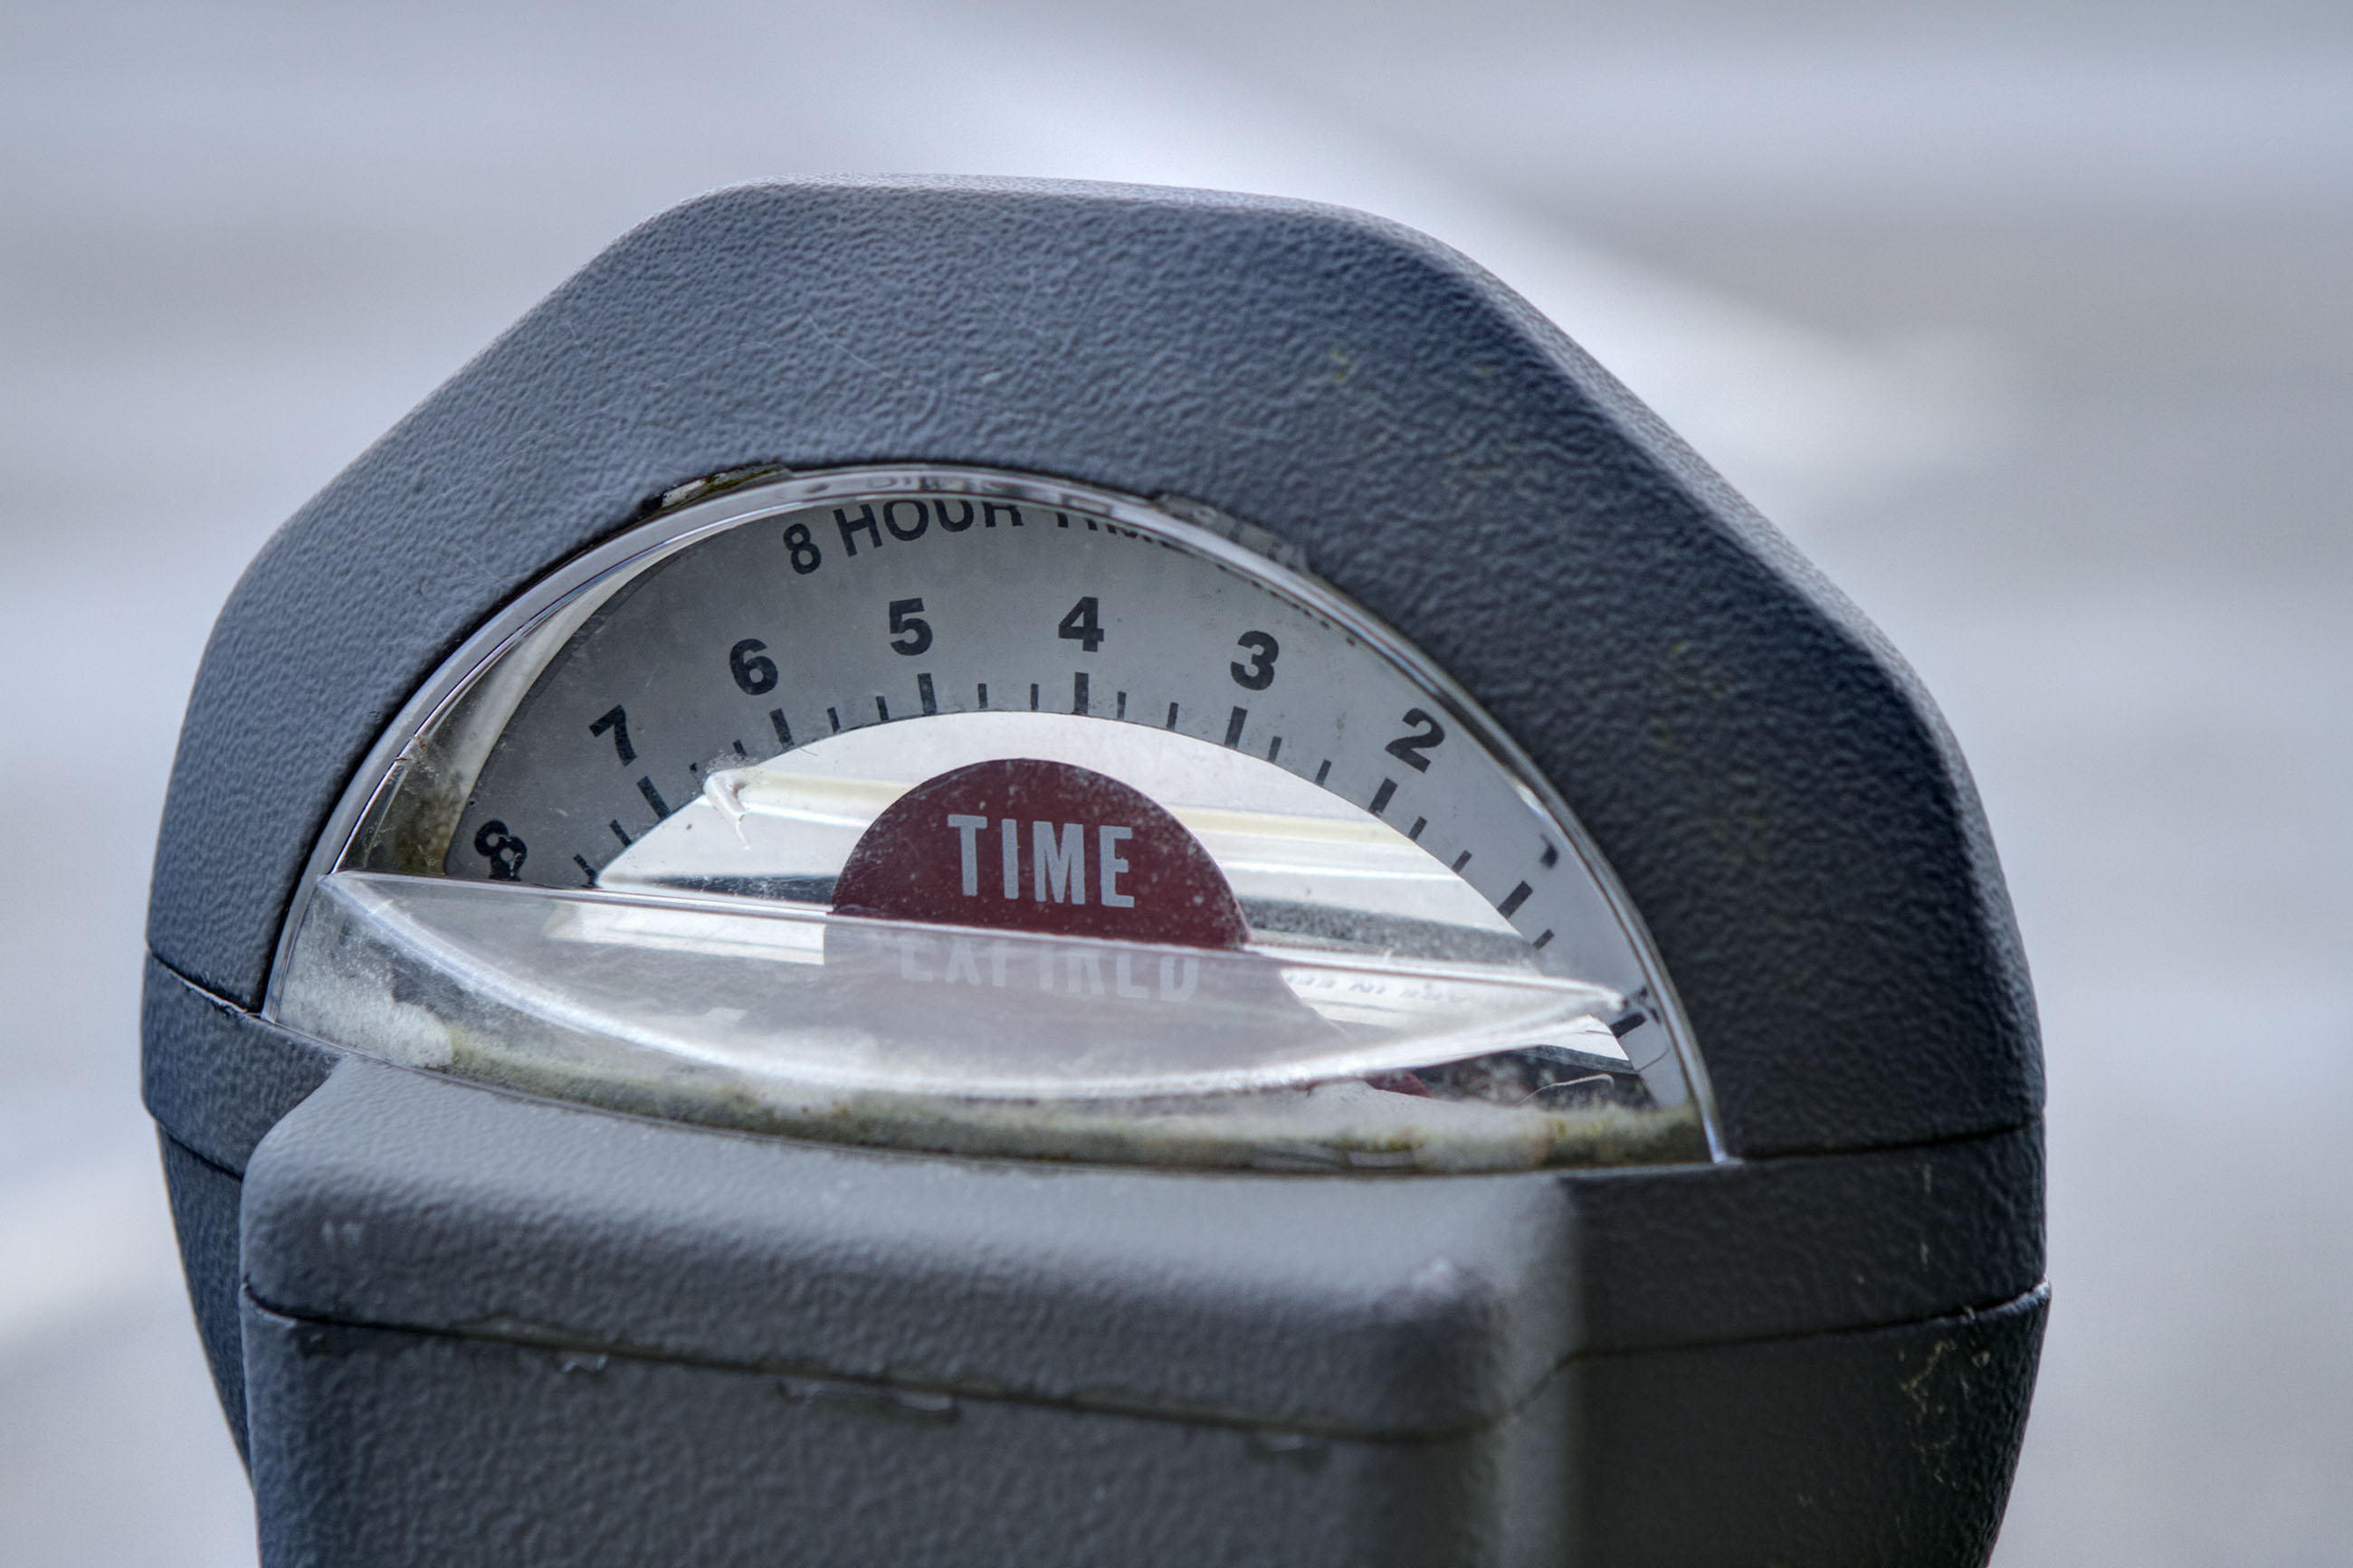 Parking Meter, Parking, Violation, Vintage, Urban, HQ Photo